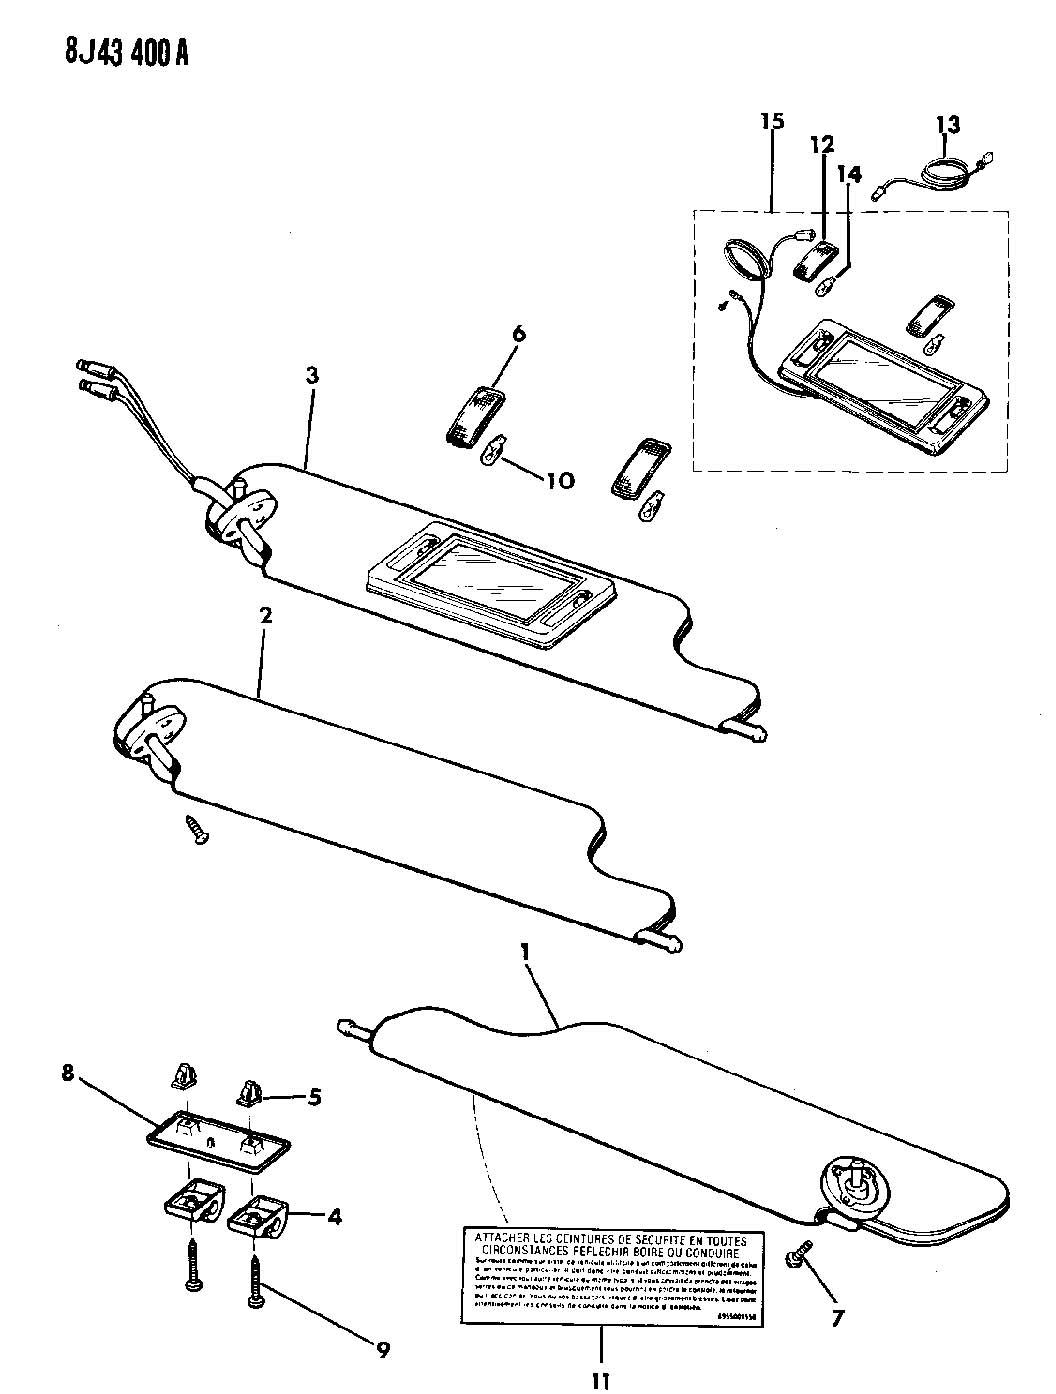 fuse box diagram besides 1993 ford f 150 fuse box diagram also 350